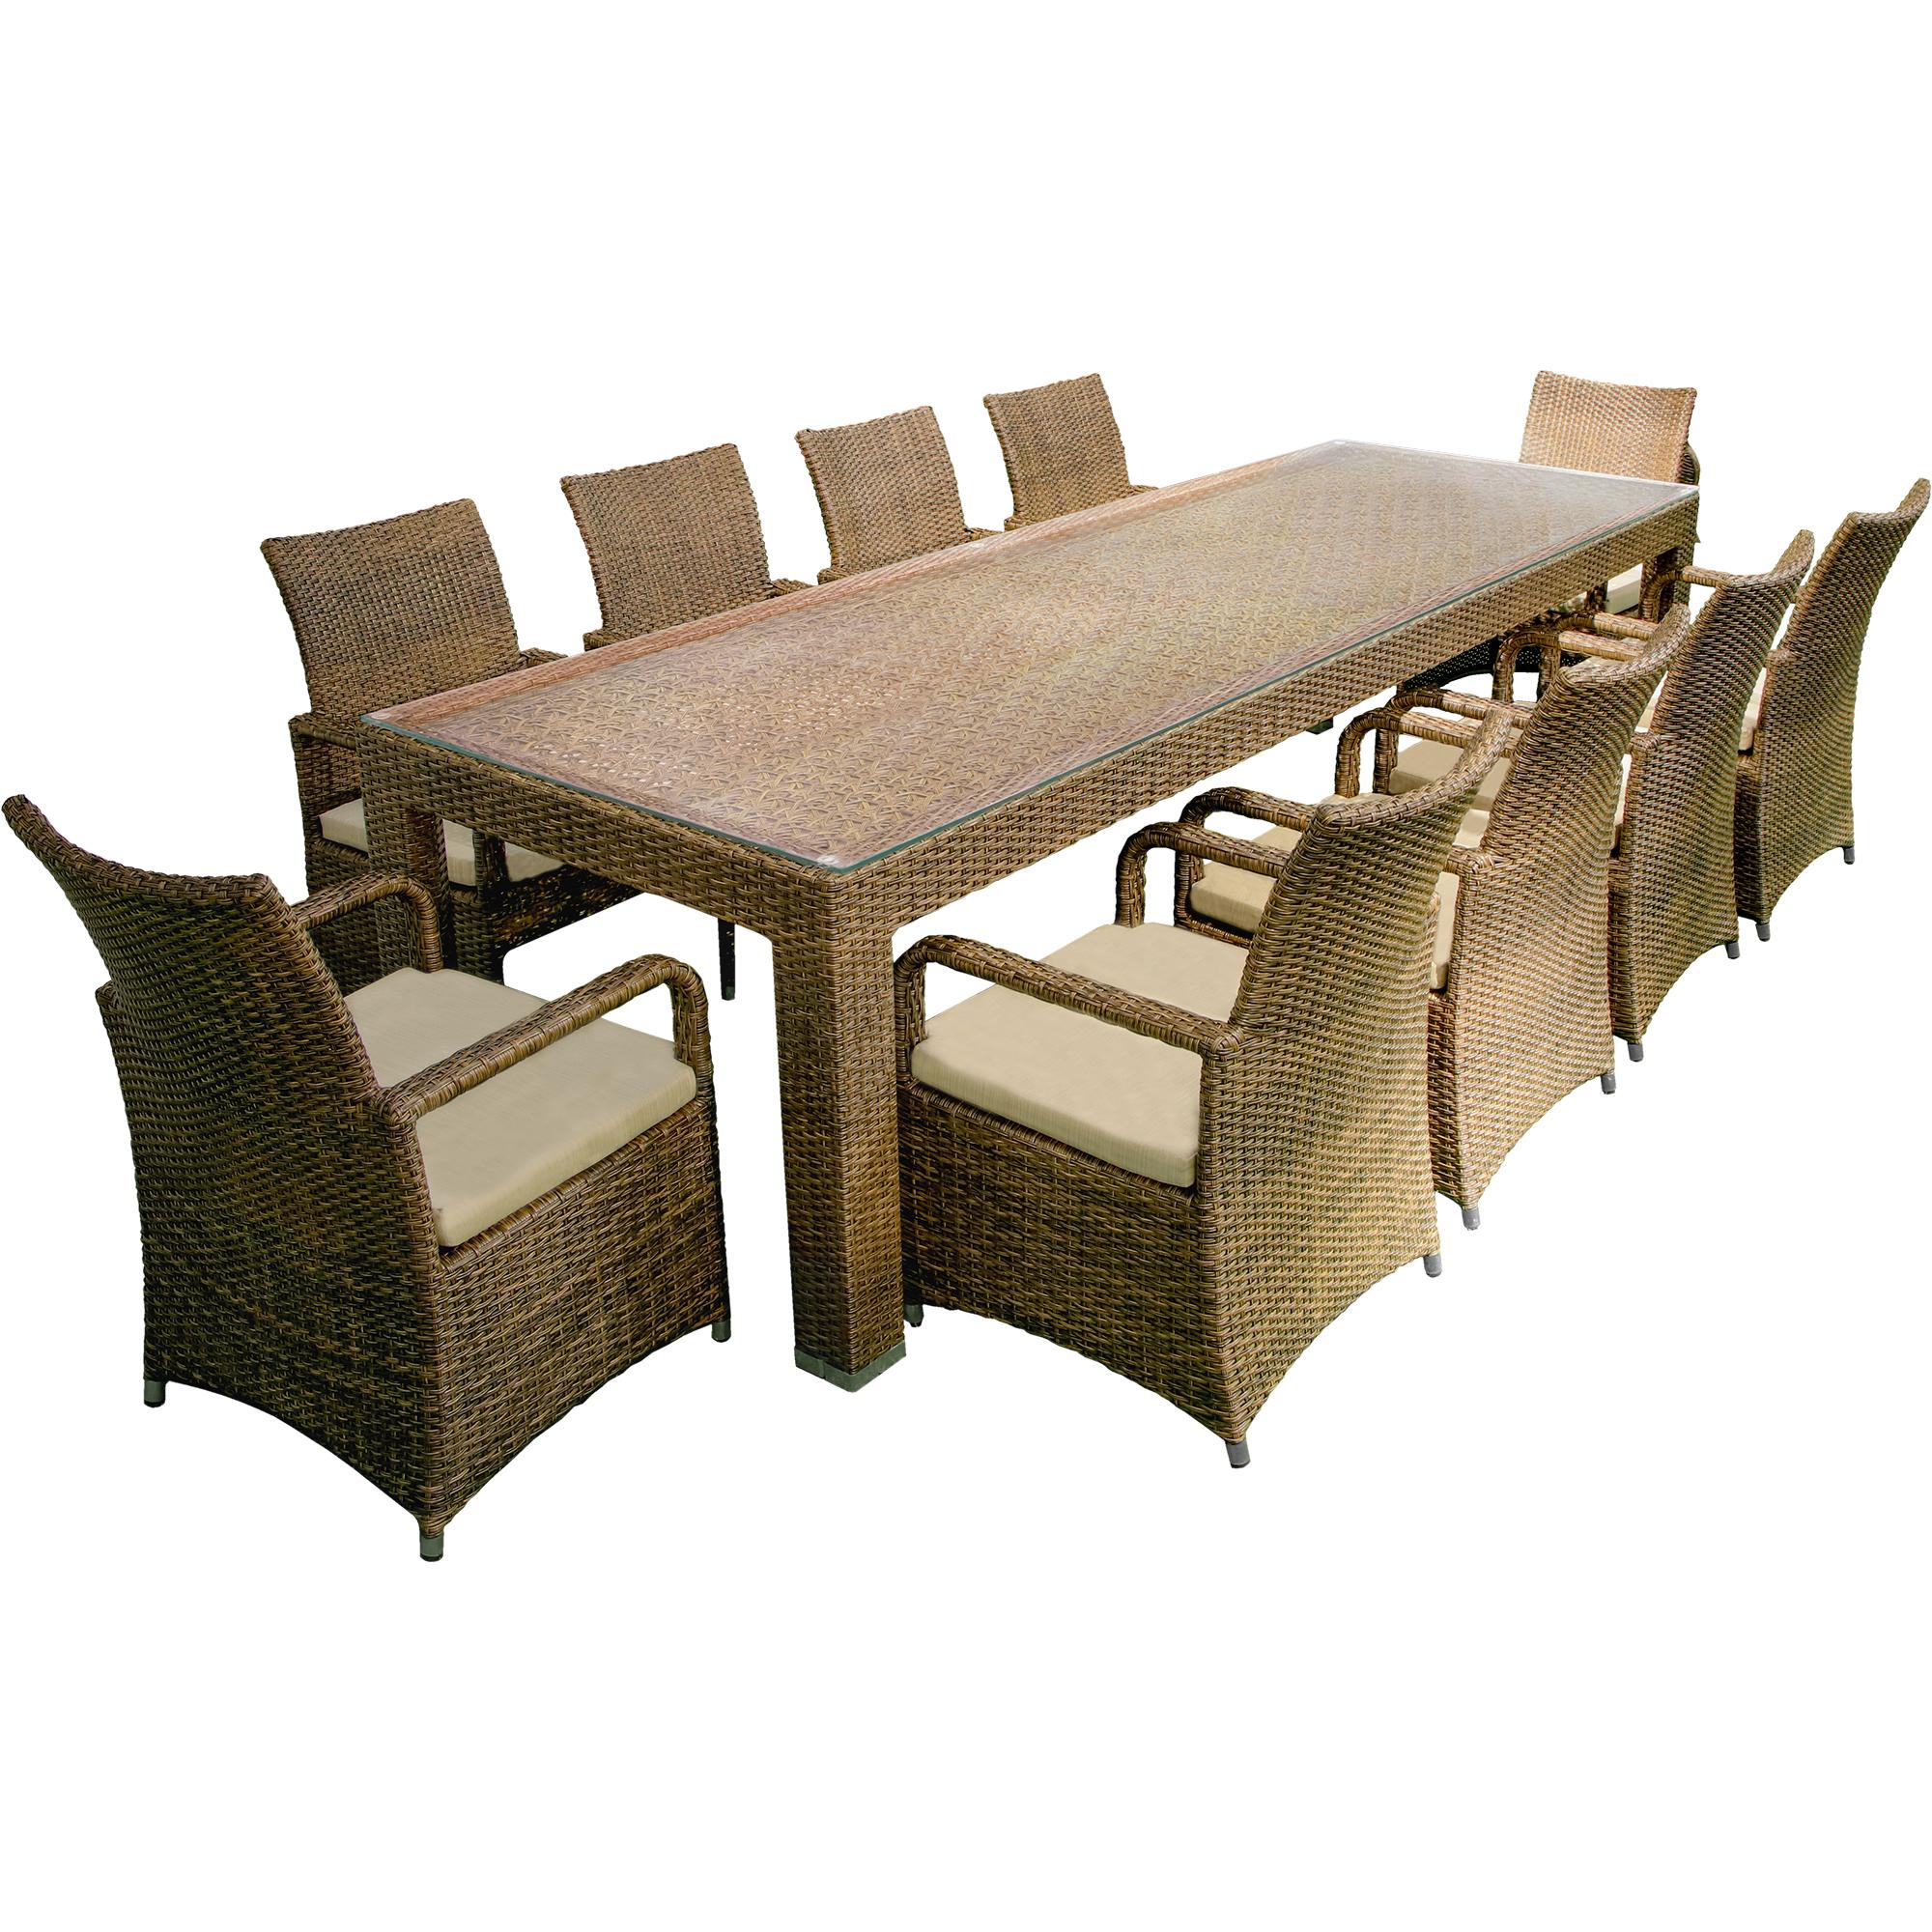 Фото - Комплект мебели Mavi rattan 11 предметов рубашка mavi 021235 620